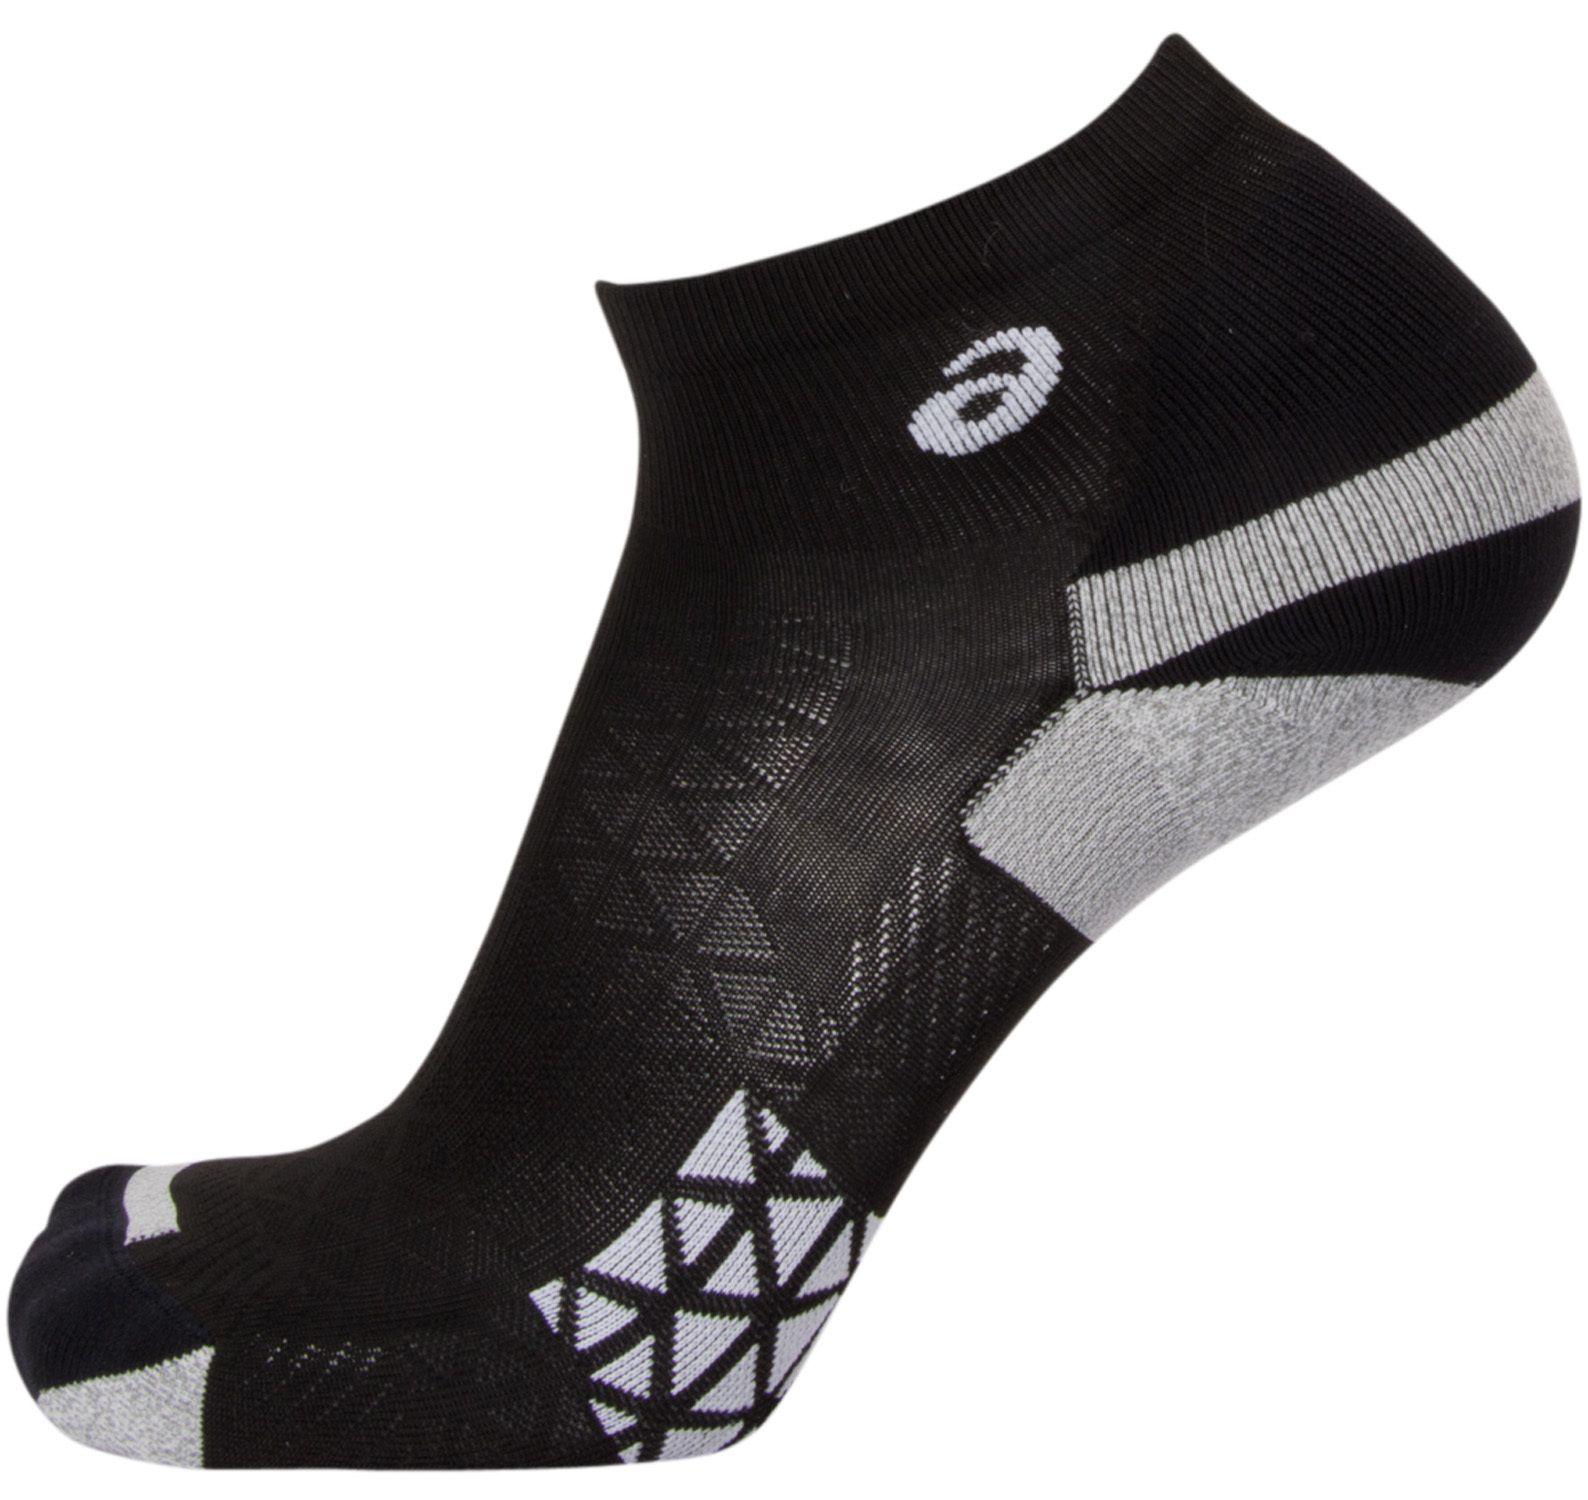 Marathon Racer Sock, Performance Black, Iv,  Kläder